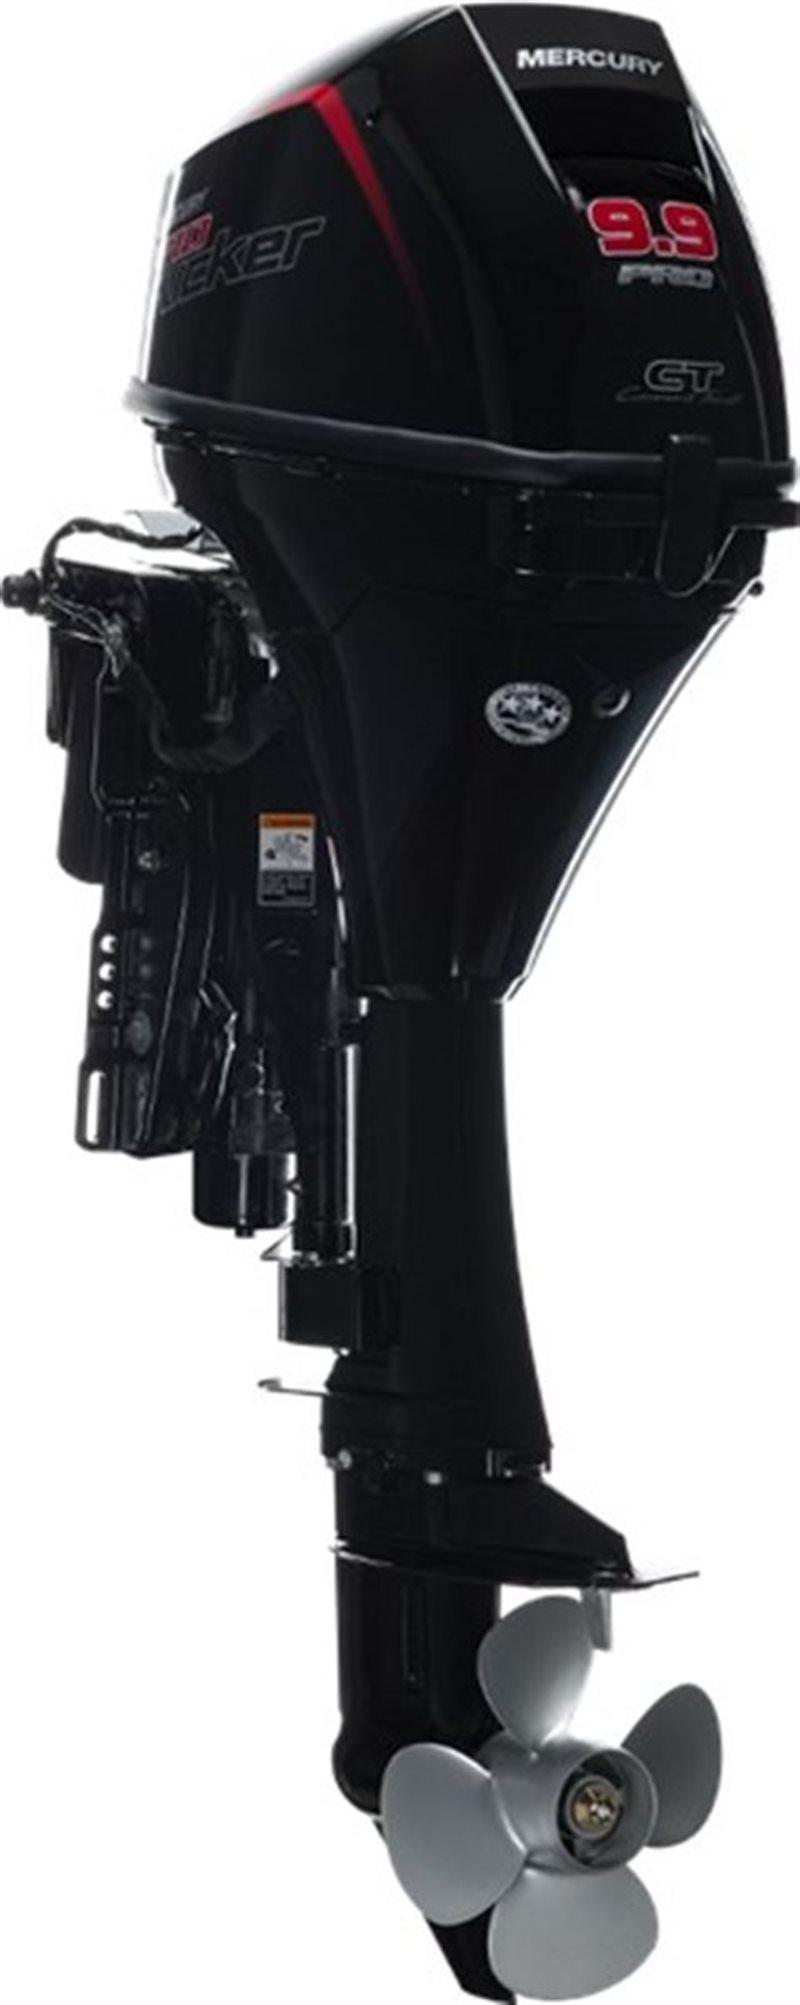 99 hp ProKicker at Jacksonville Powersports, Jacksonville, FL 32225